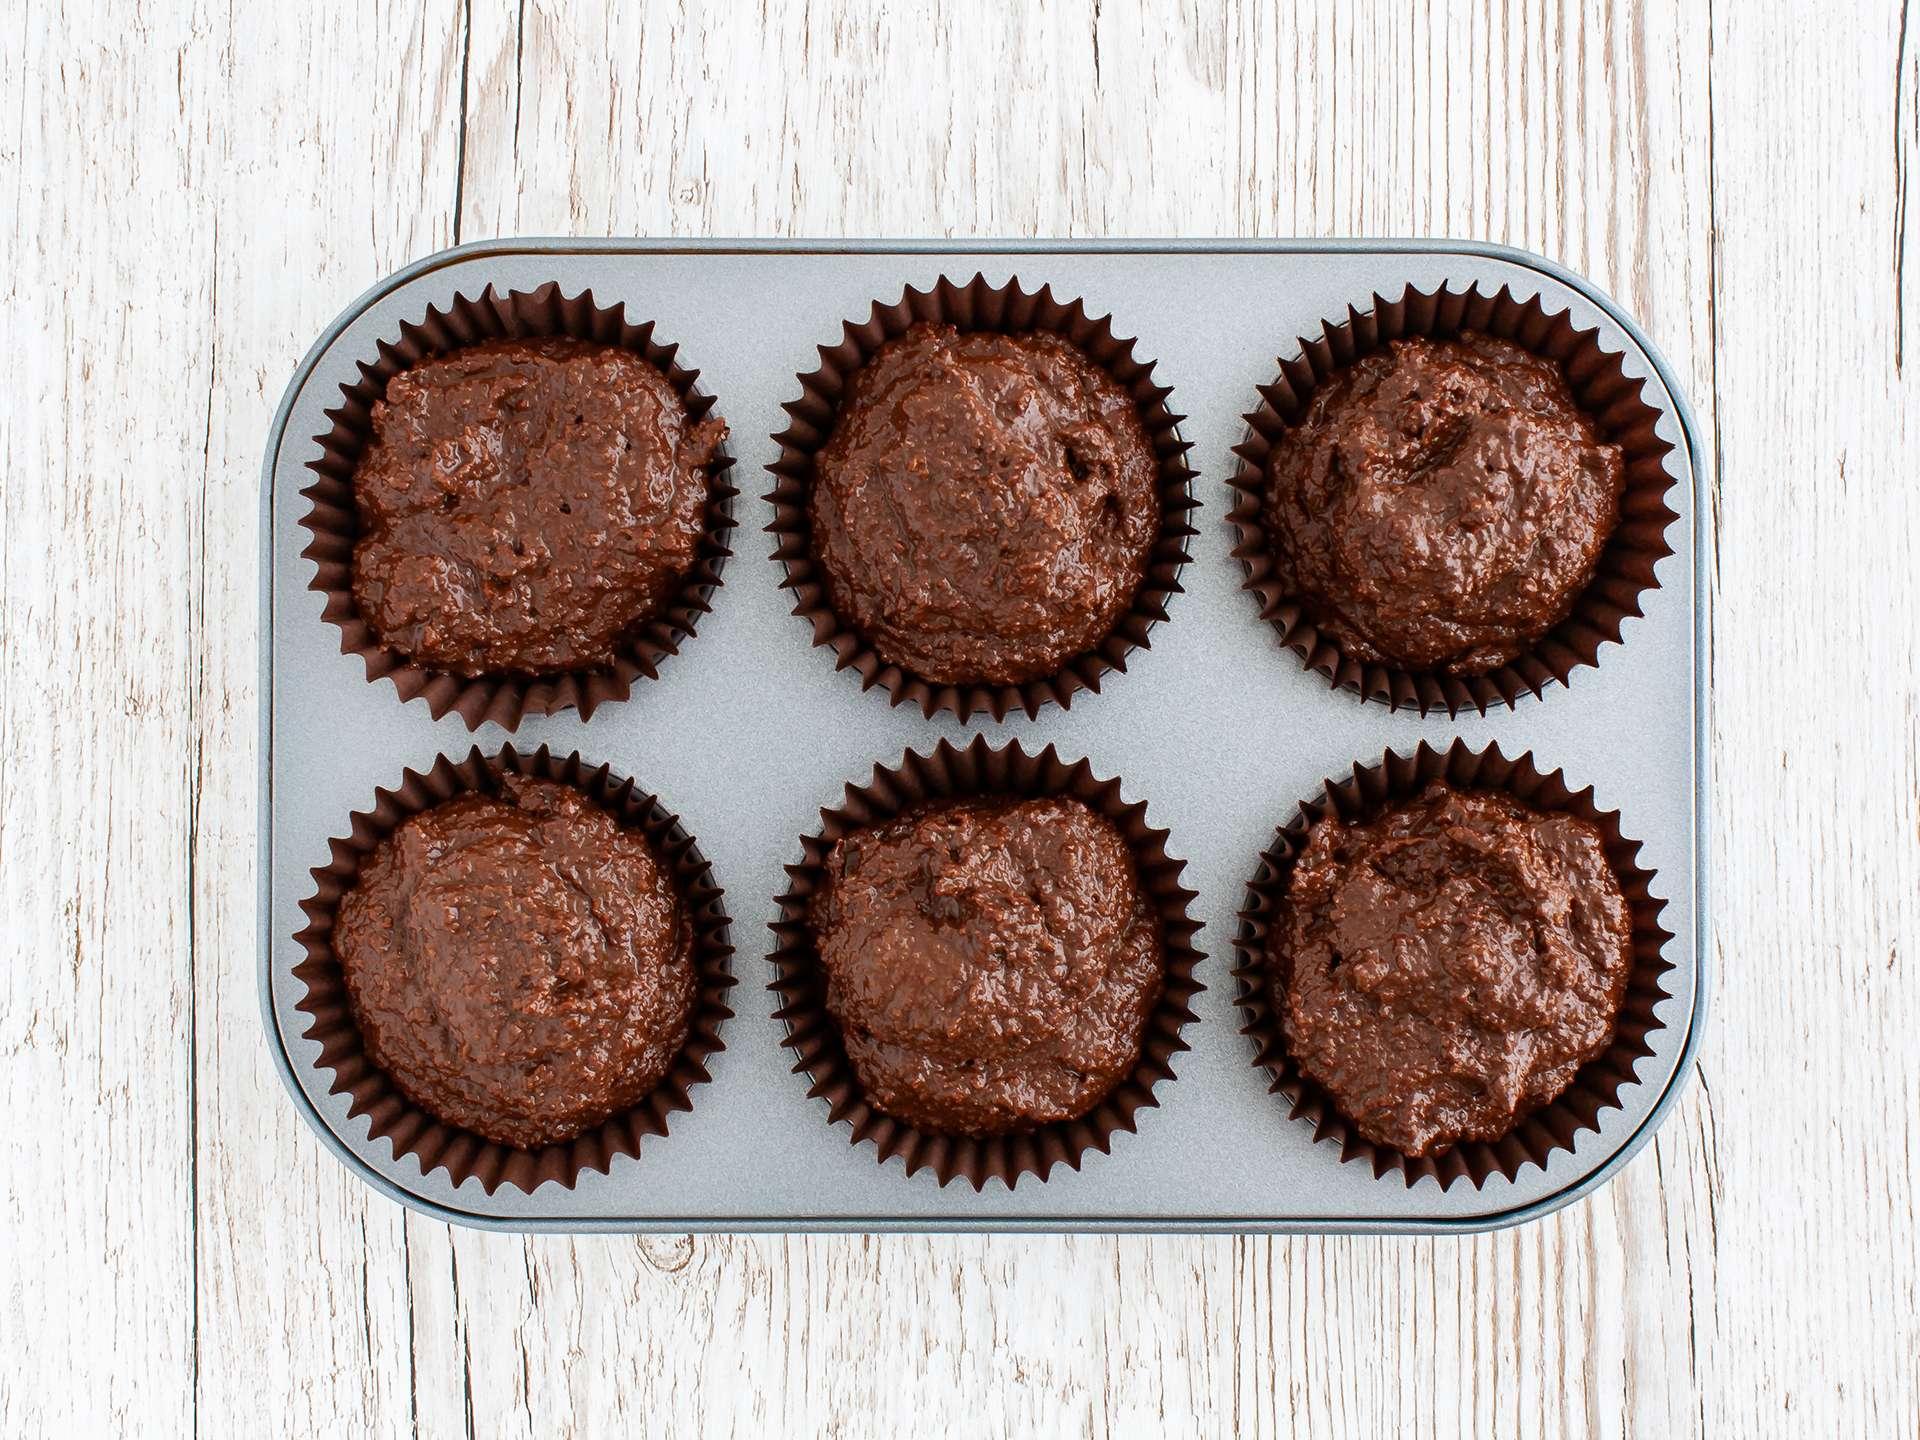 Step 3.1 of Gluten Free Vegan Chocolate Cupcakes with Apricot Jam Recipe